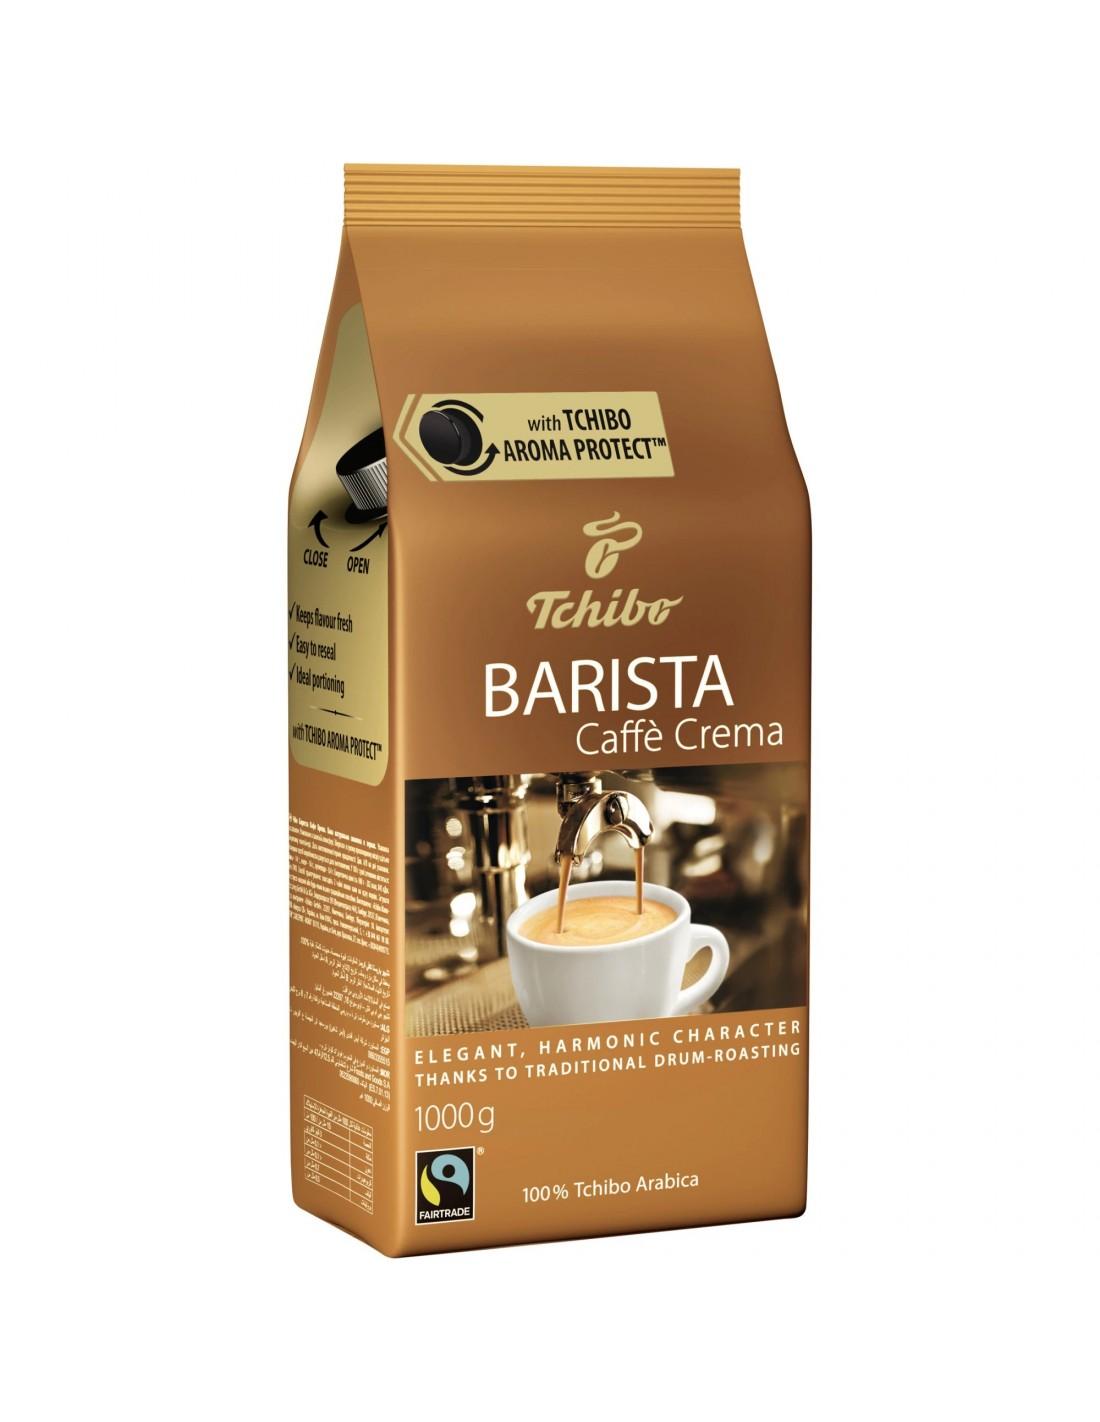 Cafea boabe Tchibo Barista Crema, 1kg